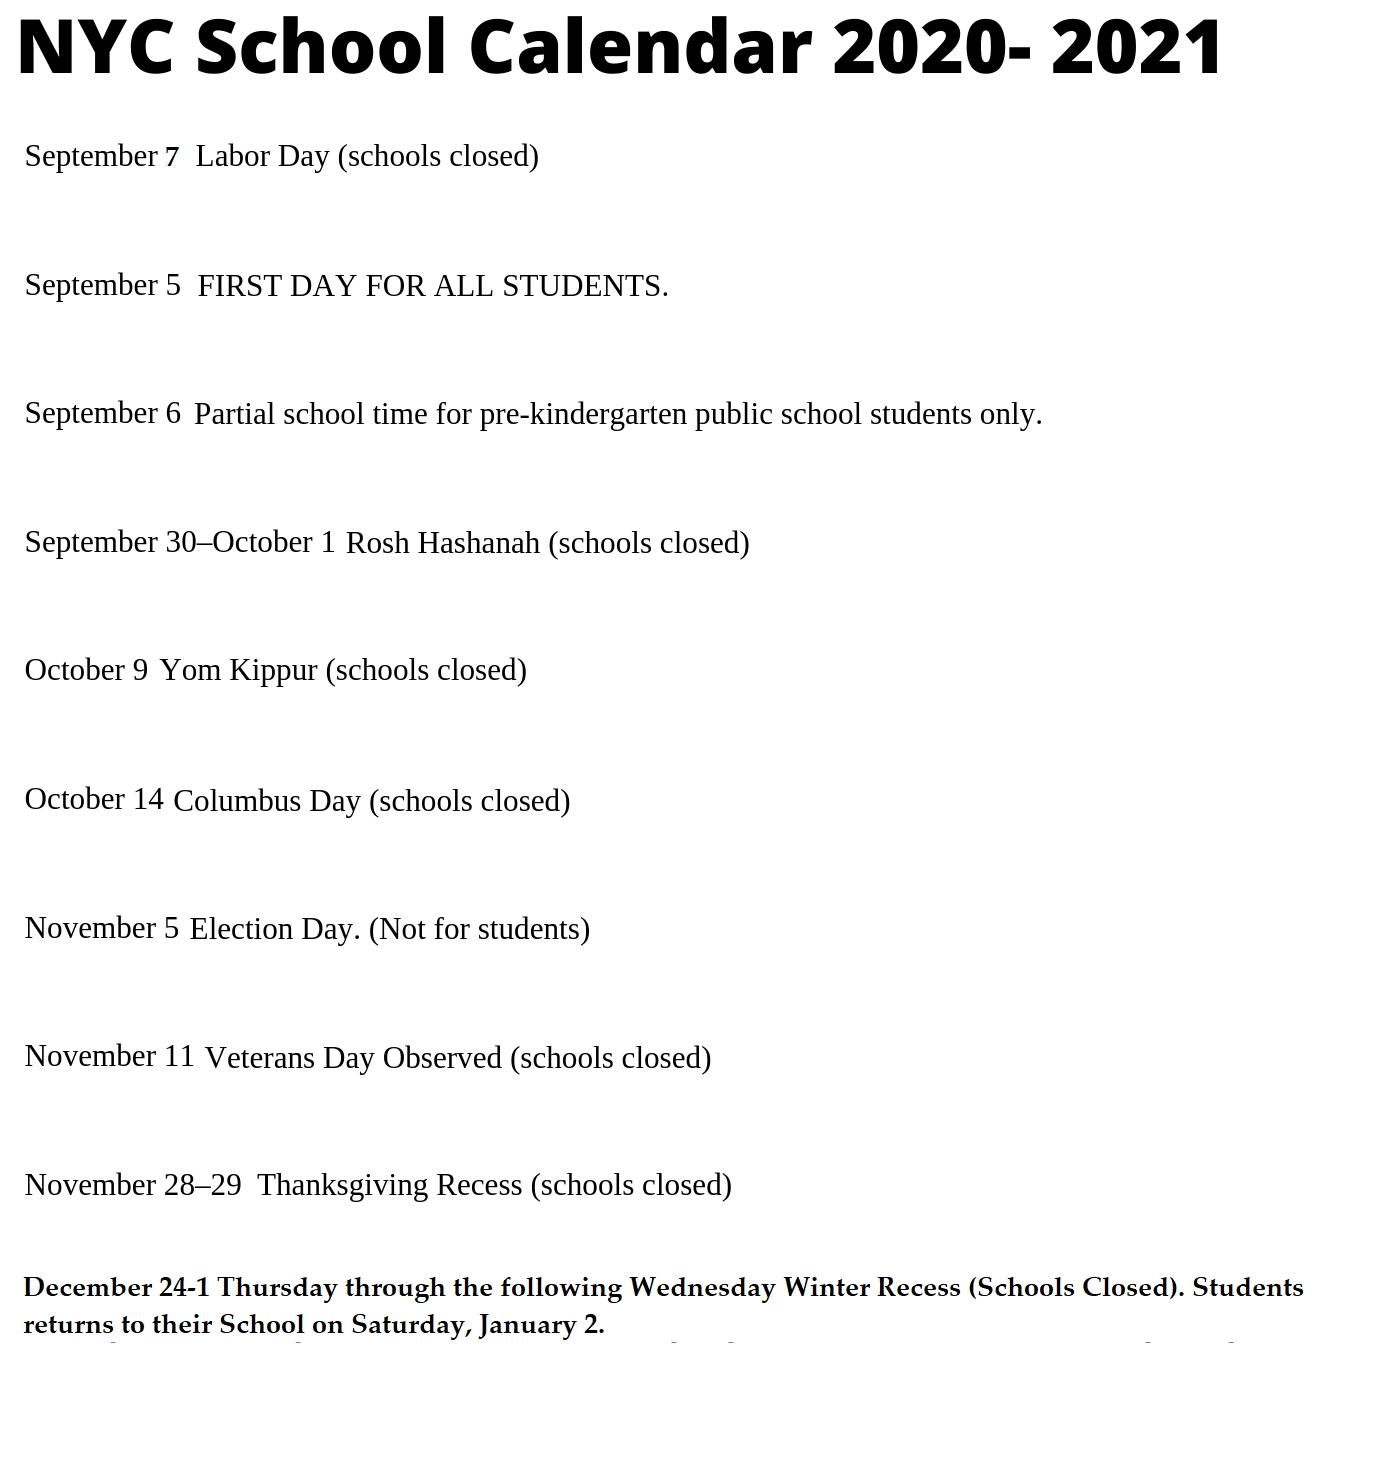 🥰Nyc School Holidays Calendar 2020-2021🥰